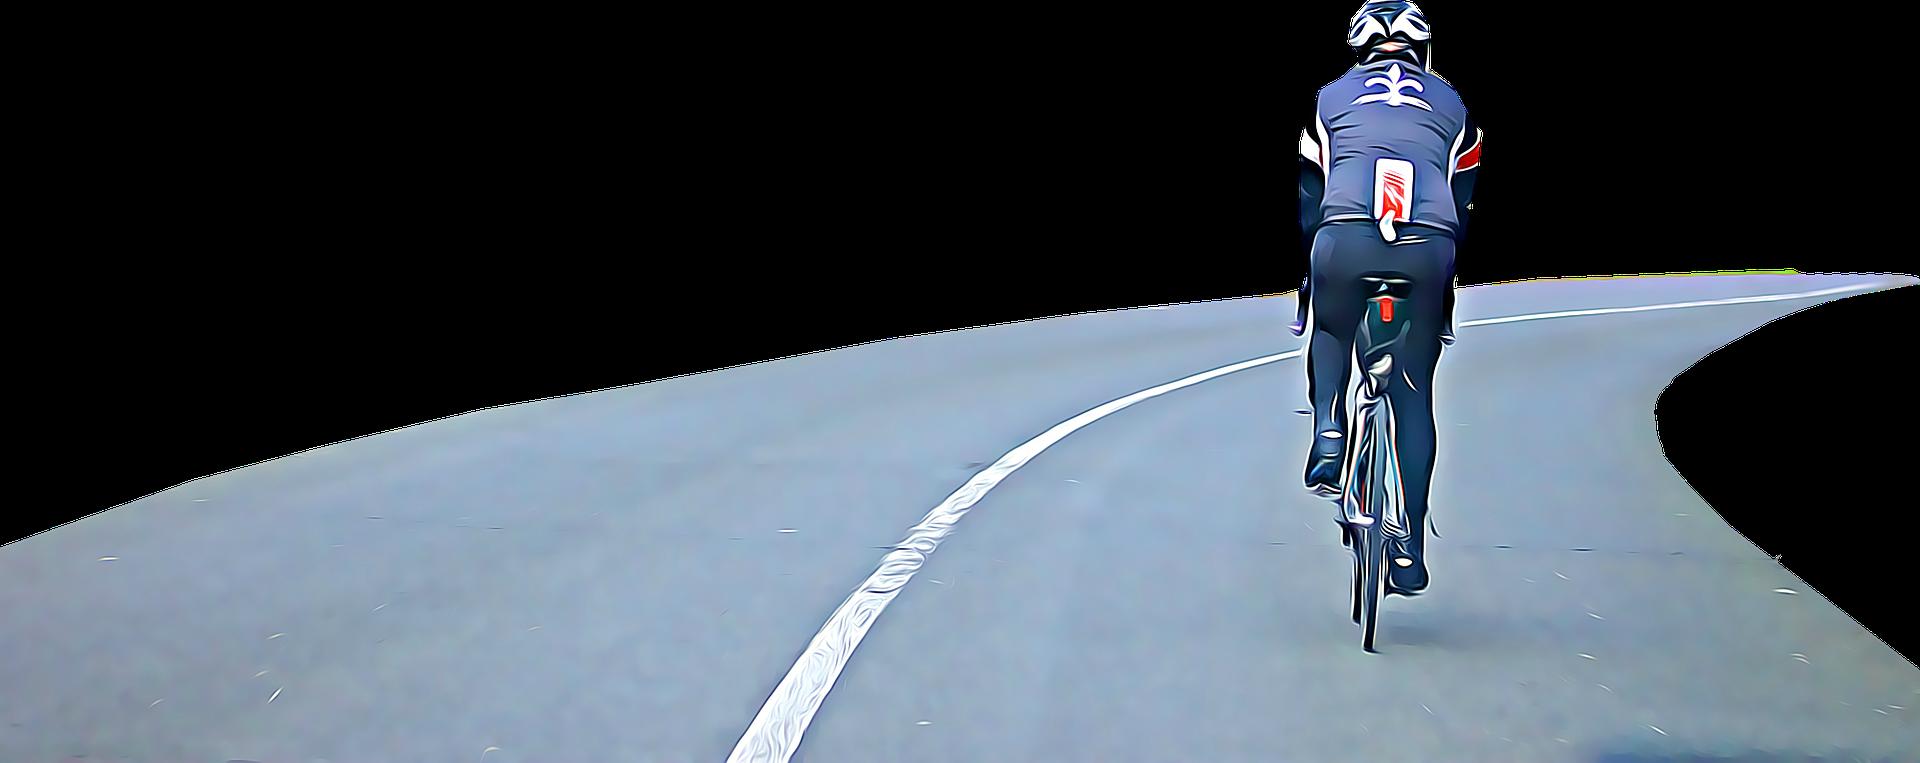 Las luces parpadeantes para ciclistas ya son legales